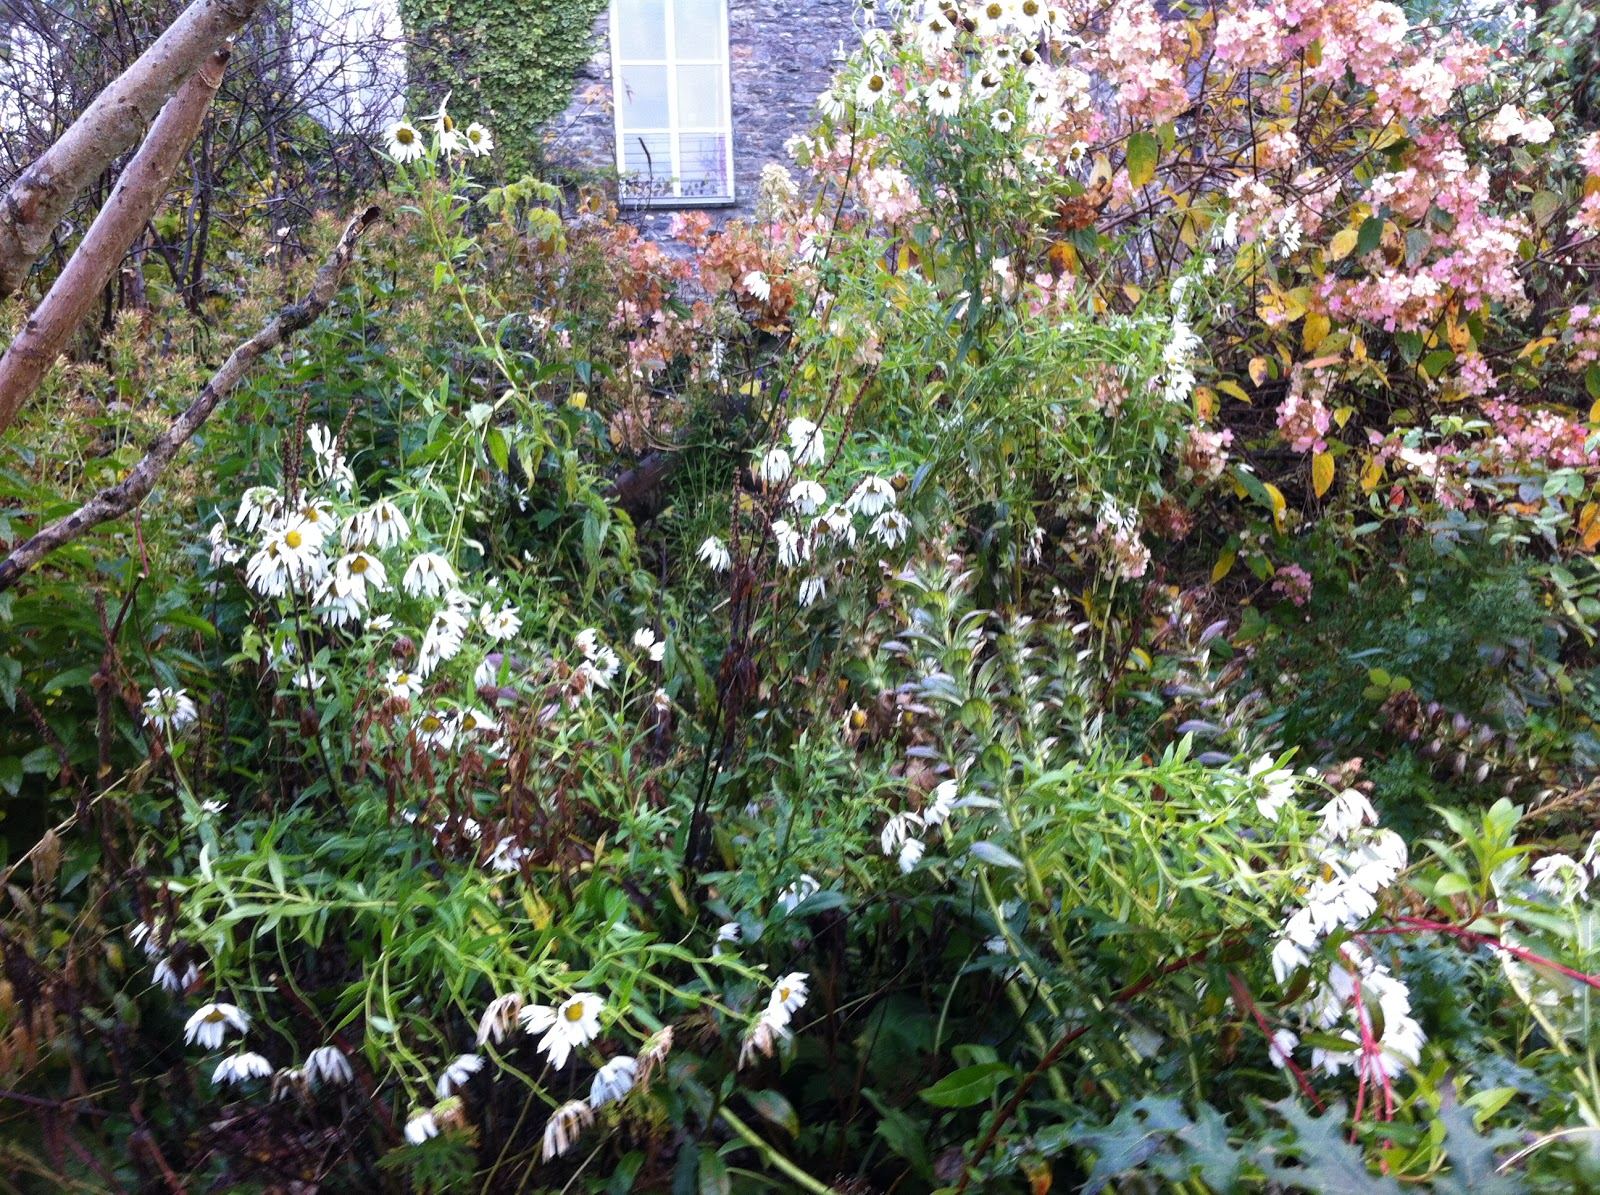 Backyard Flower Farmer :  garden  Common Farm Flowers  The Flower Farmer  British flowers by